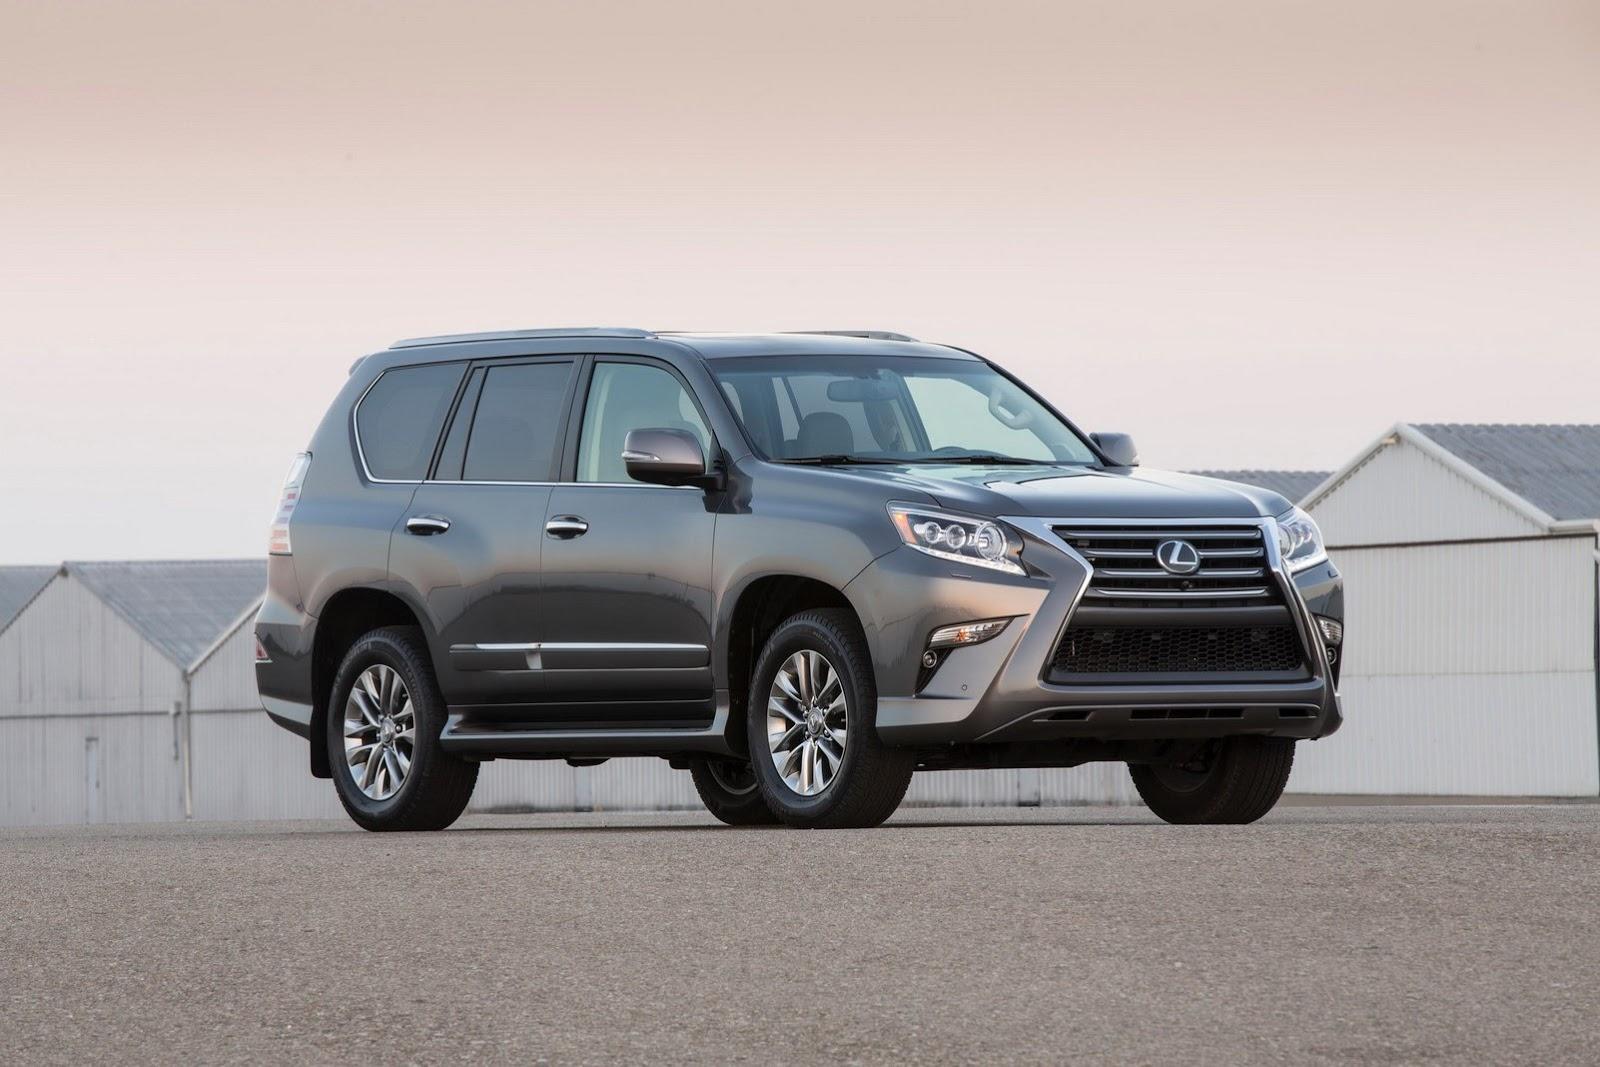 2009/13 - [Toyota/Lexus] Land Cruiser / GX Restylés - Page 4 2014-Lexus-GX-Facelift-2%252524%25255B2%25255D